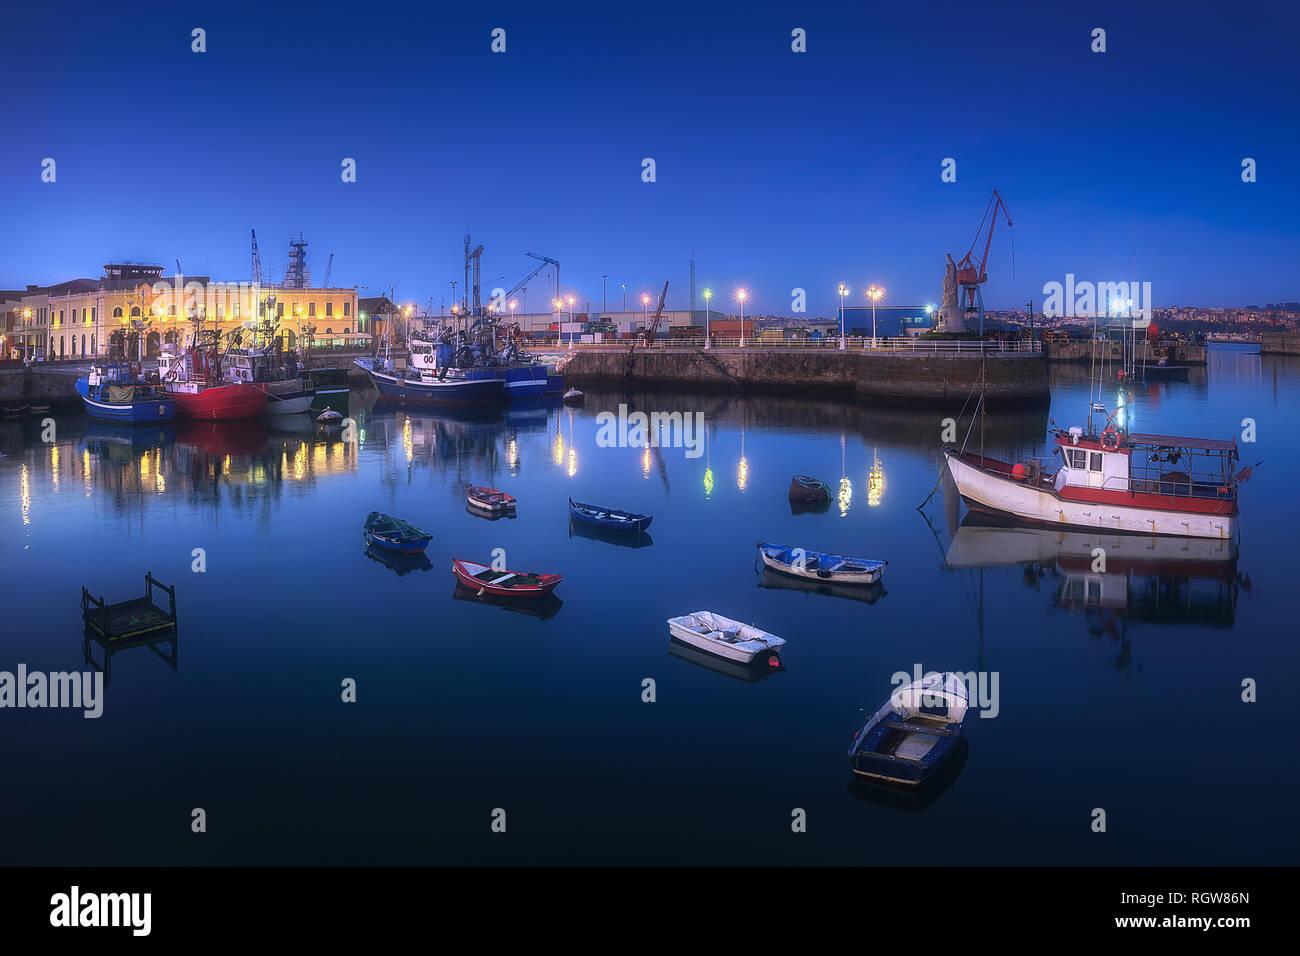 Santurce port at night - Stock Image